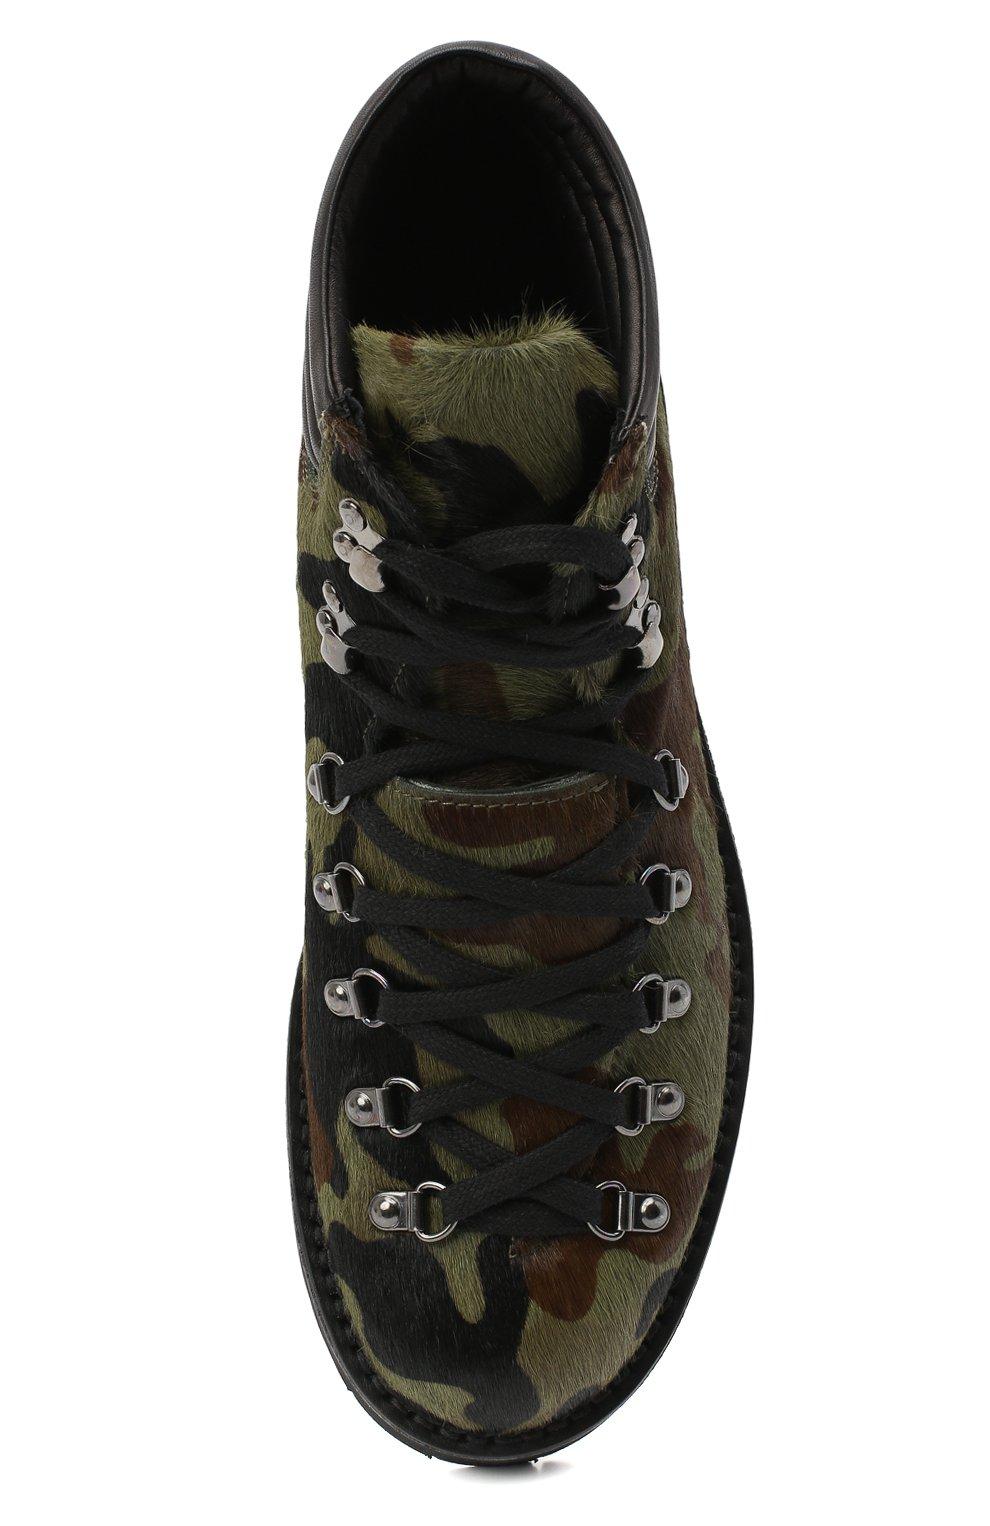 Мужские кожаные ботинки m127 FRACAP зеленого цвета, арт. M127/P0NY/IMB.NEBR./CALFSKIN/CANNA FUCILI/R0CCIA | Фото 5